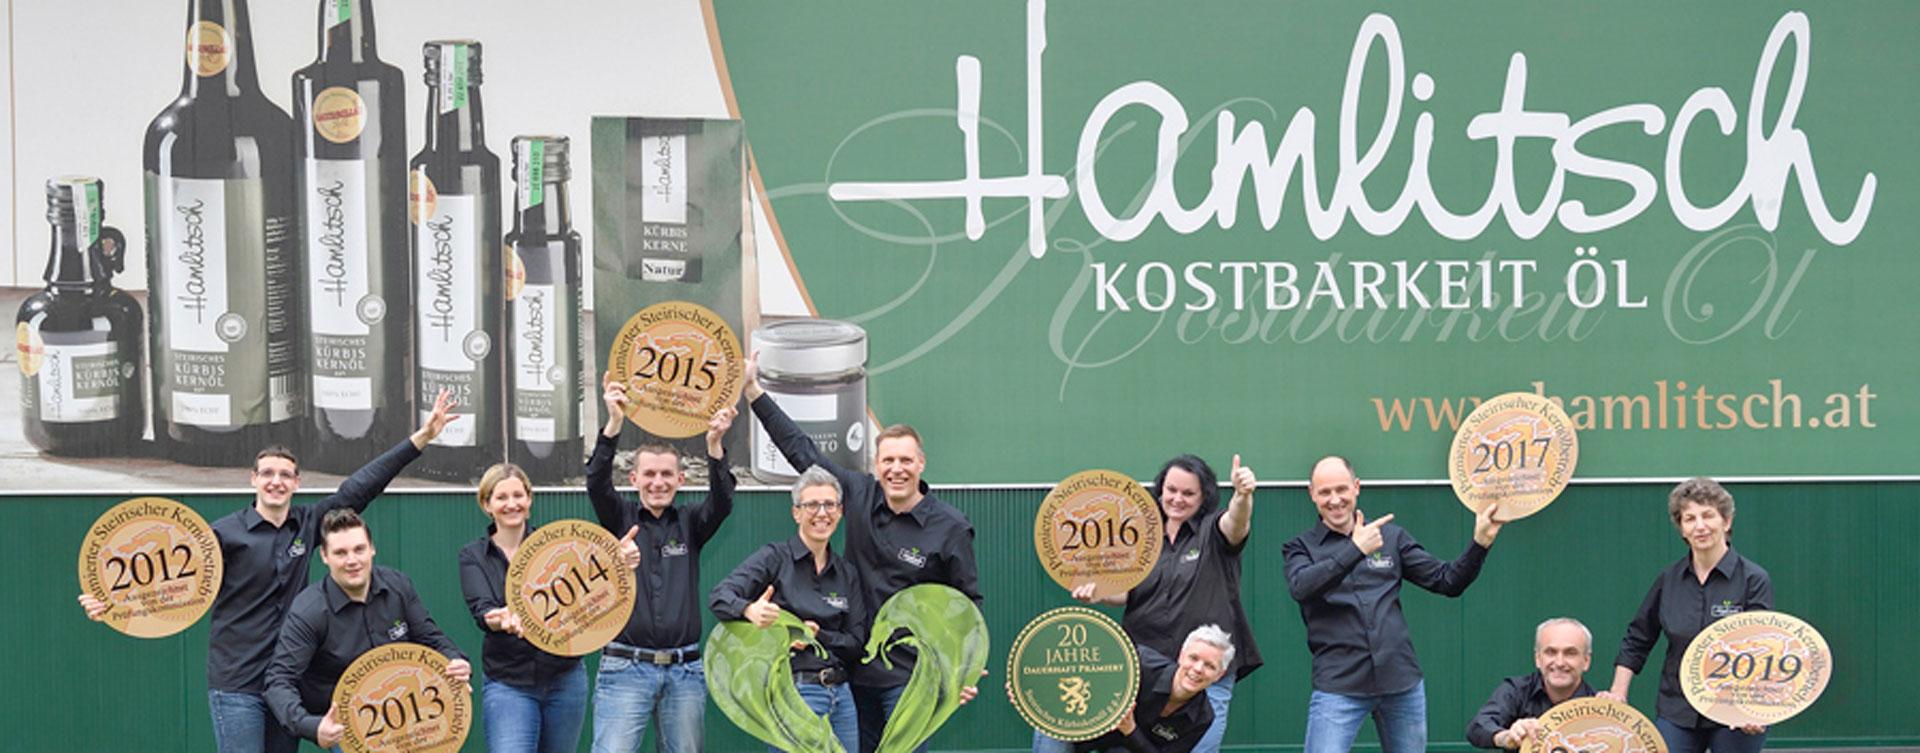 Hamlitsch GmbH & Co KG